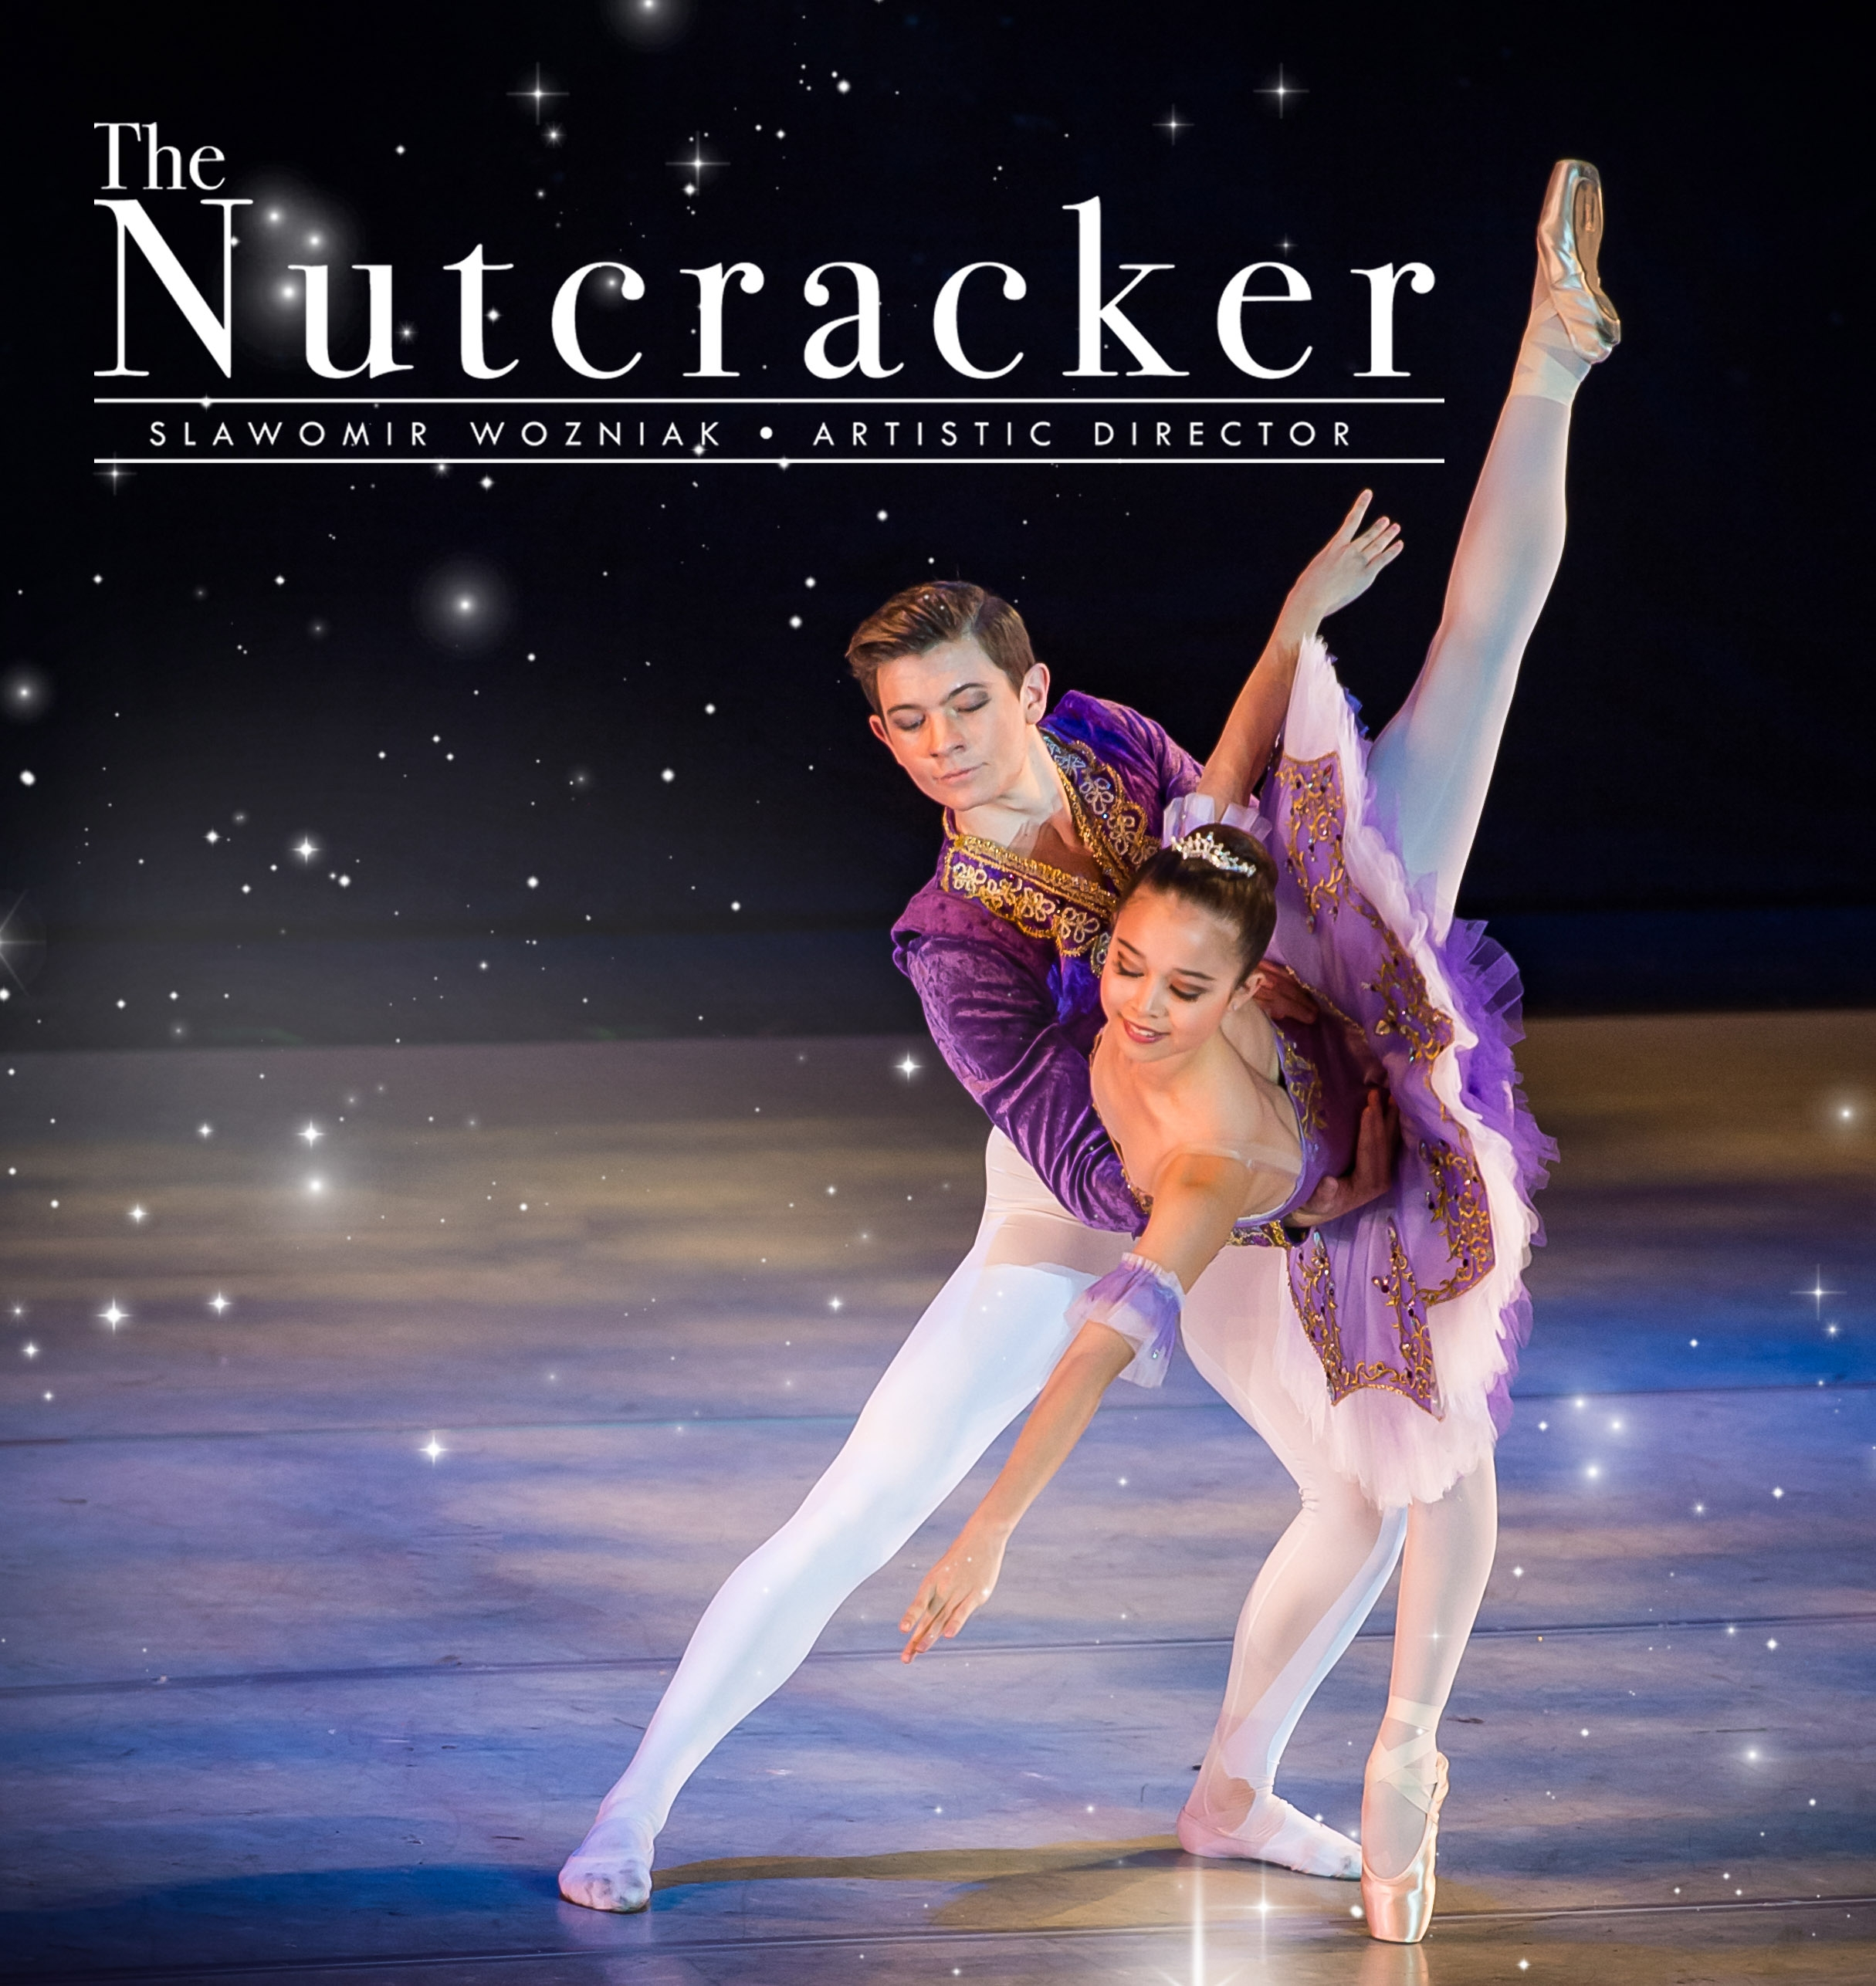 Photo by BMC Photography / Dancers Jack Beckham and Mya Kresniak